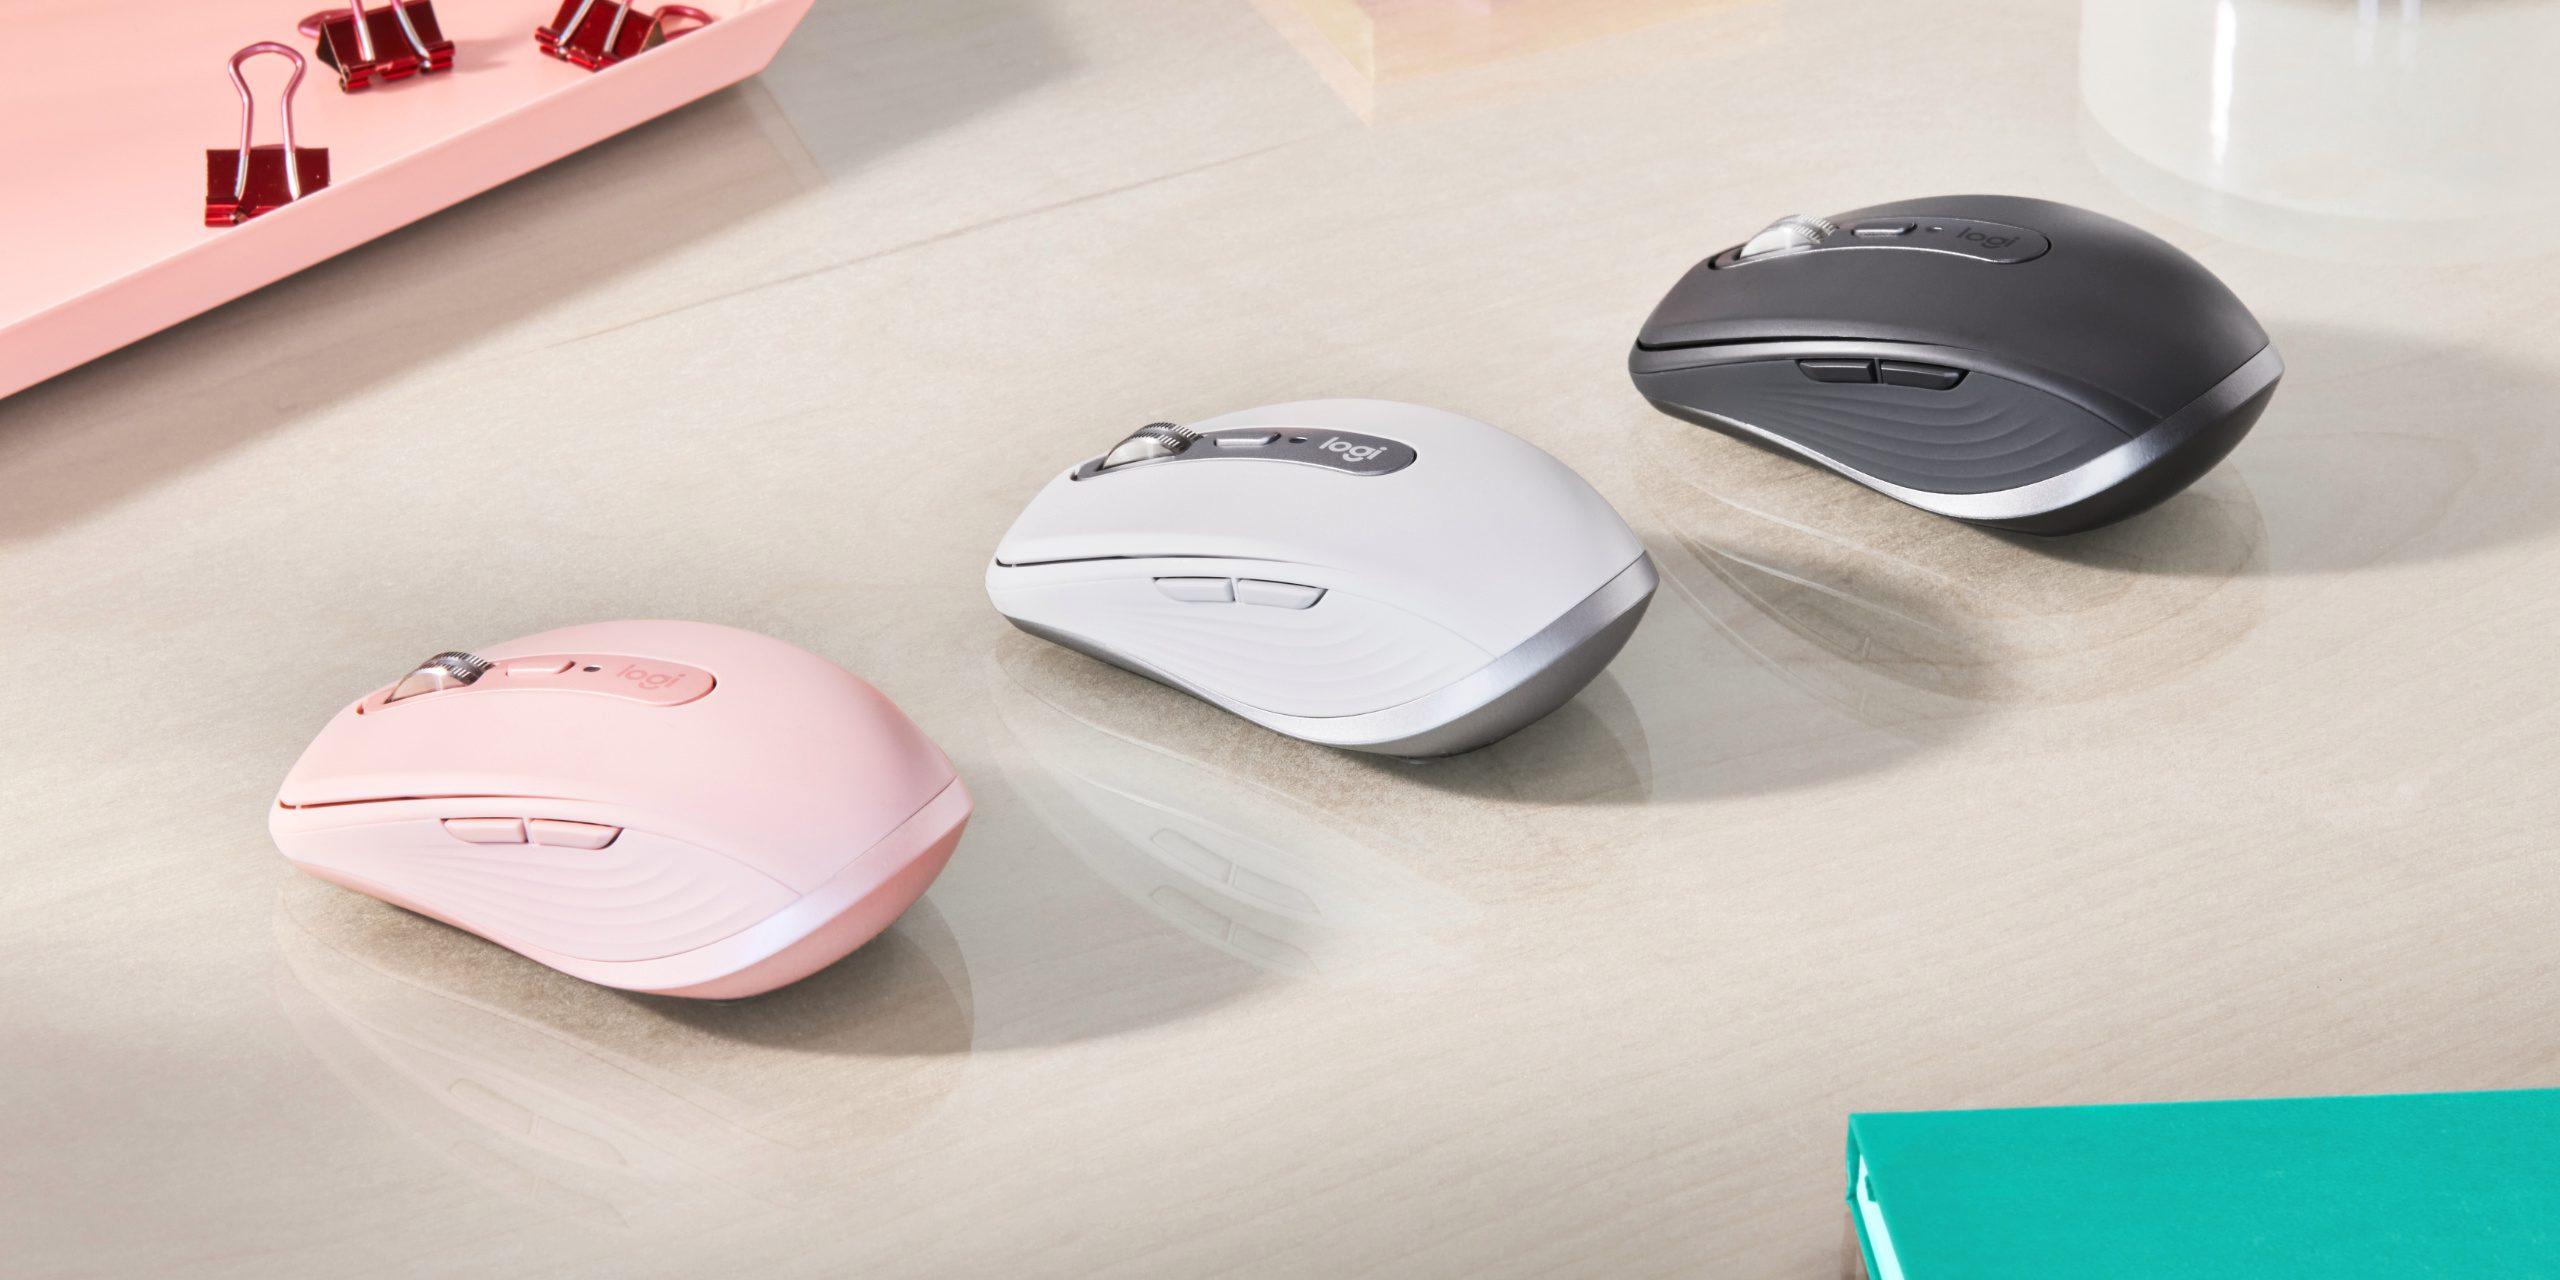 Logitech MX Anywhere 3: miglior mouse portatile